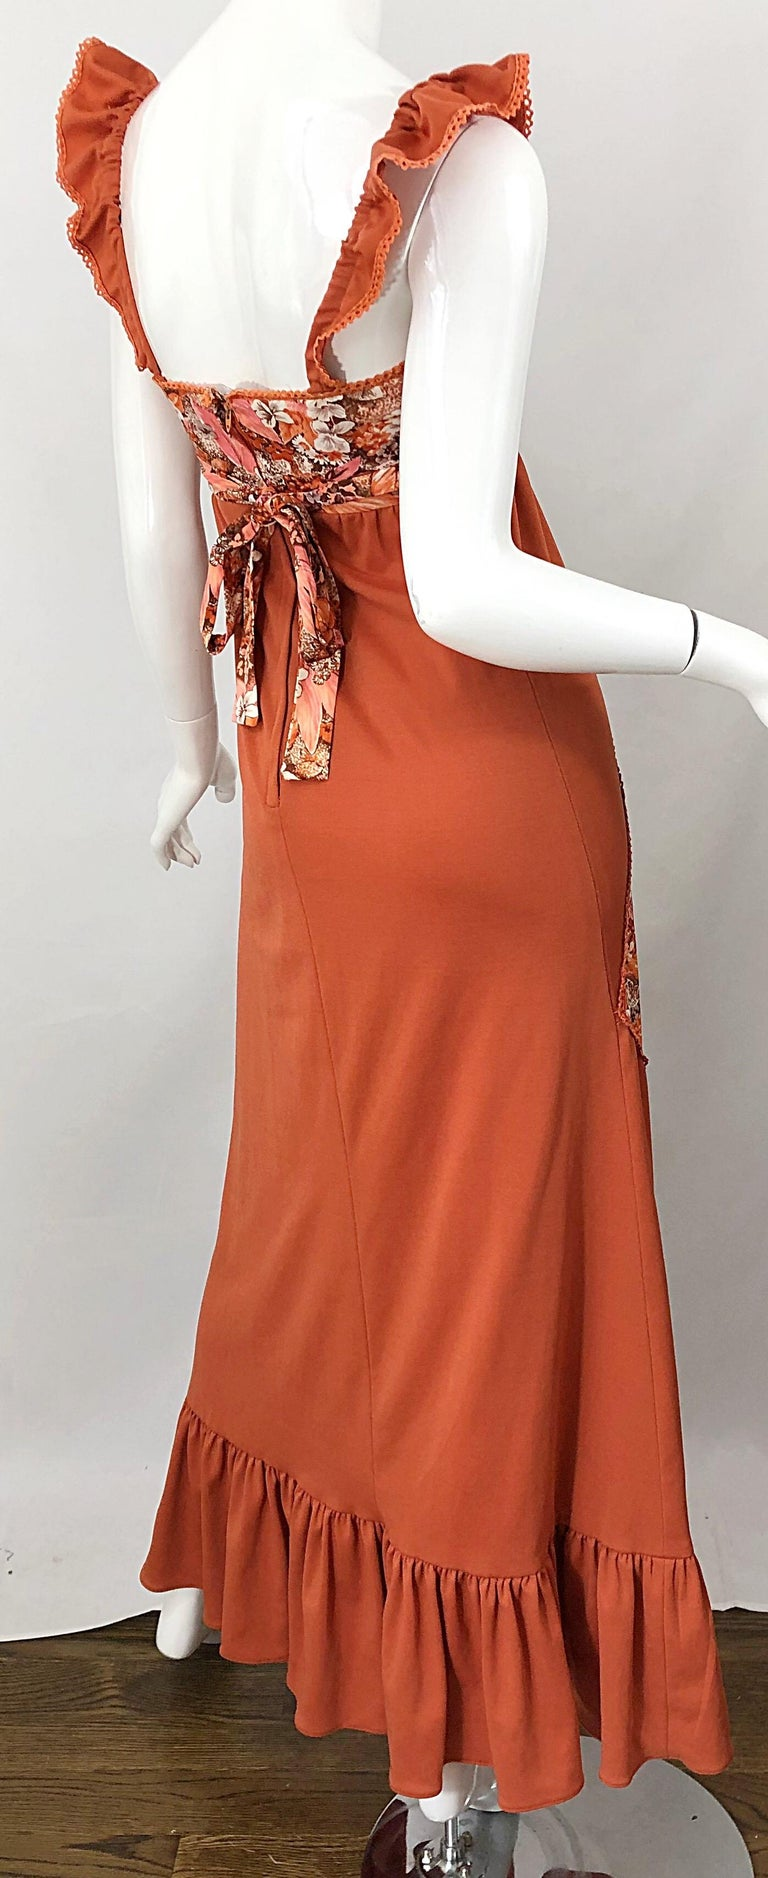 1970s Burnt Orange Patchwork Flowers Boho Vintage 70s Jersey Autumnal Maxi Dress For Sale 3